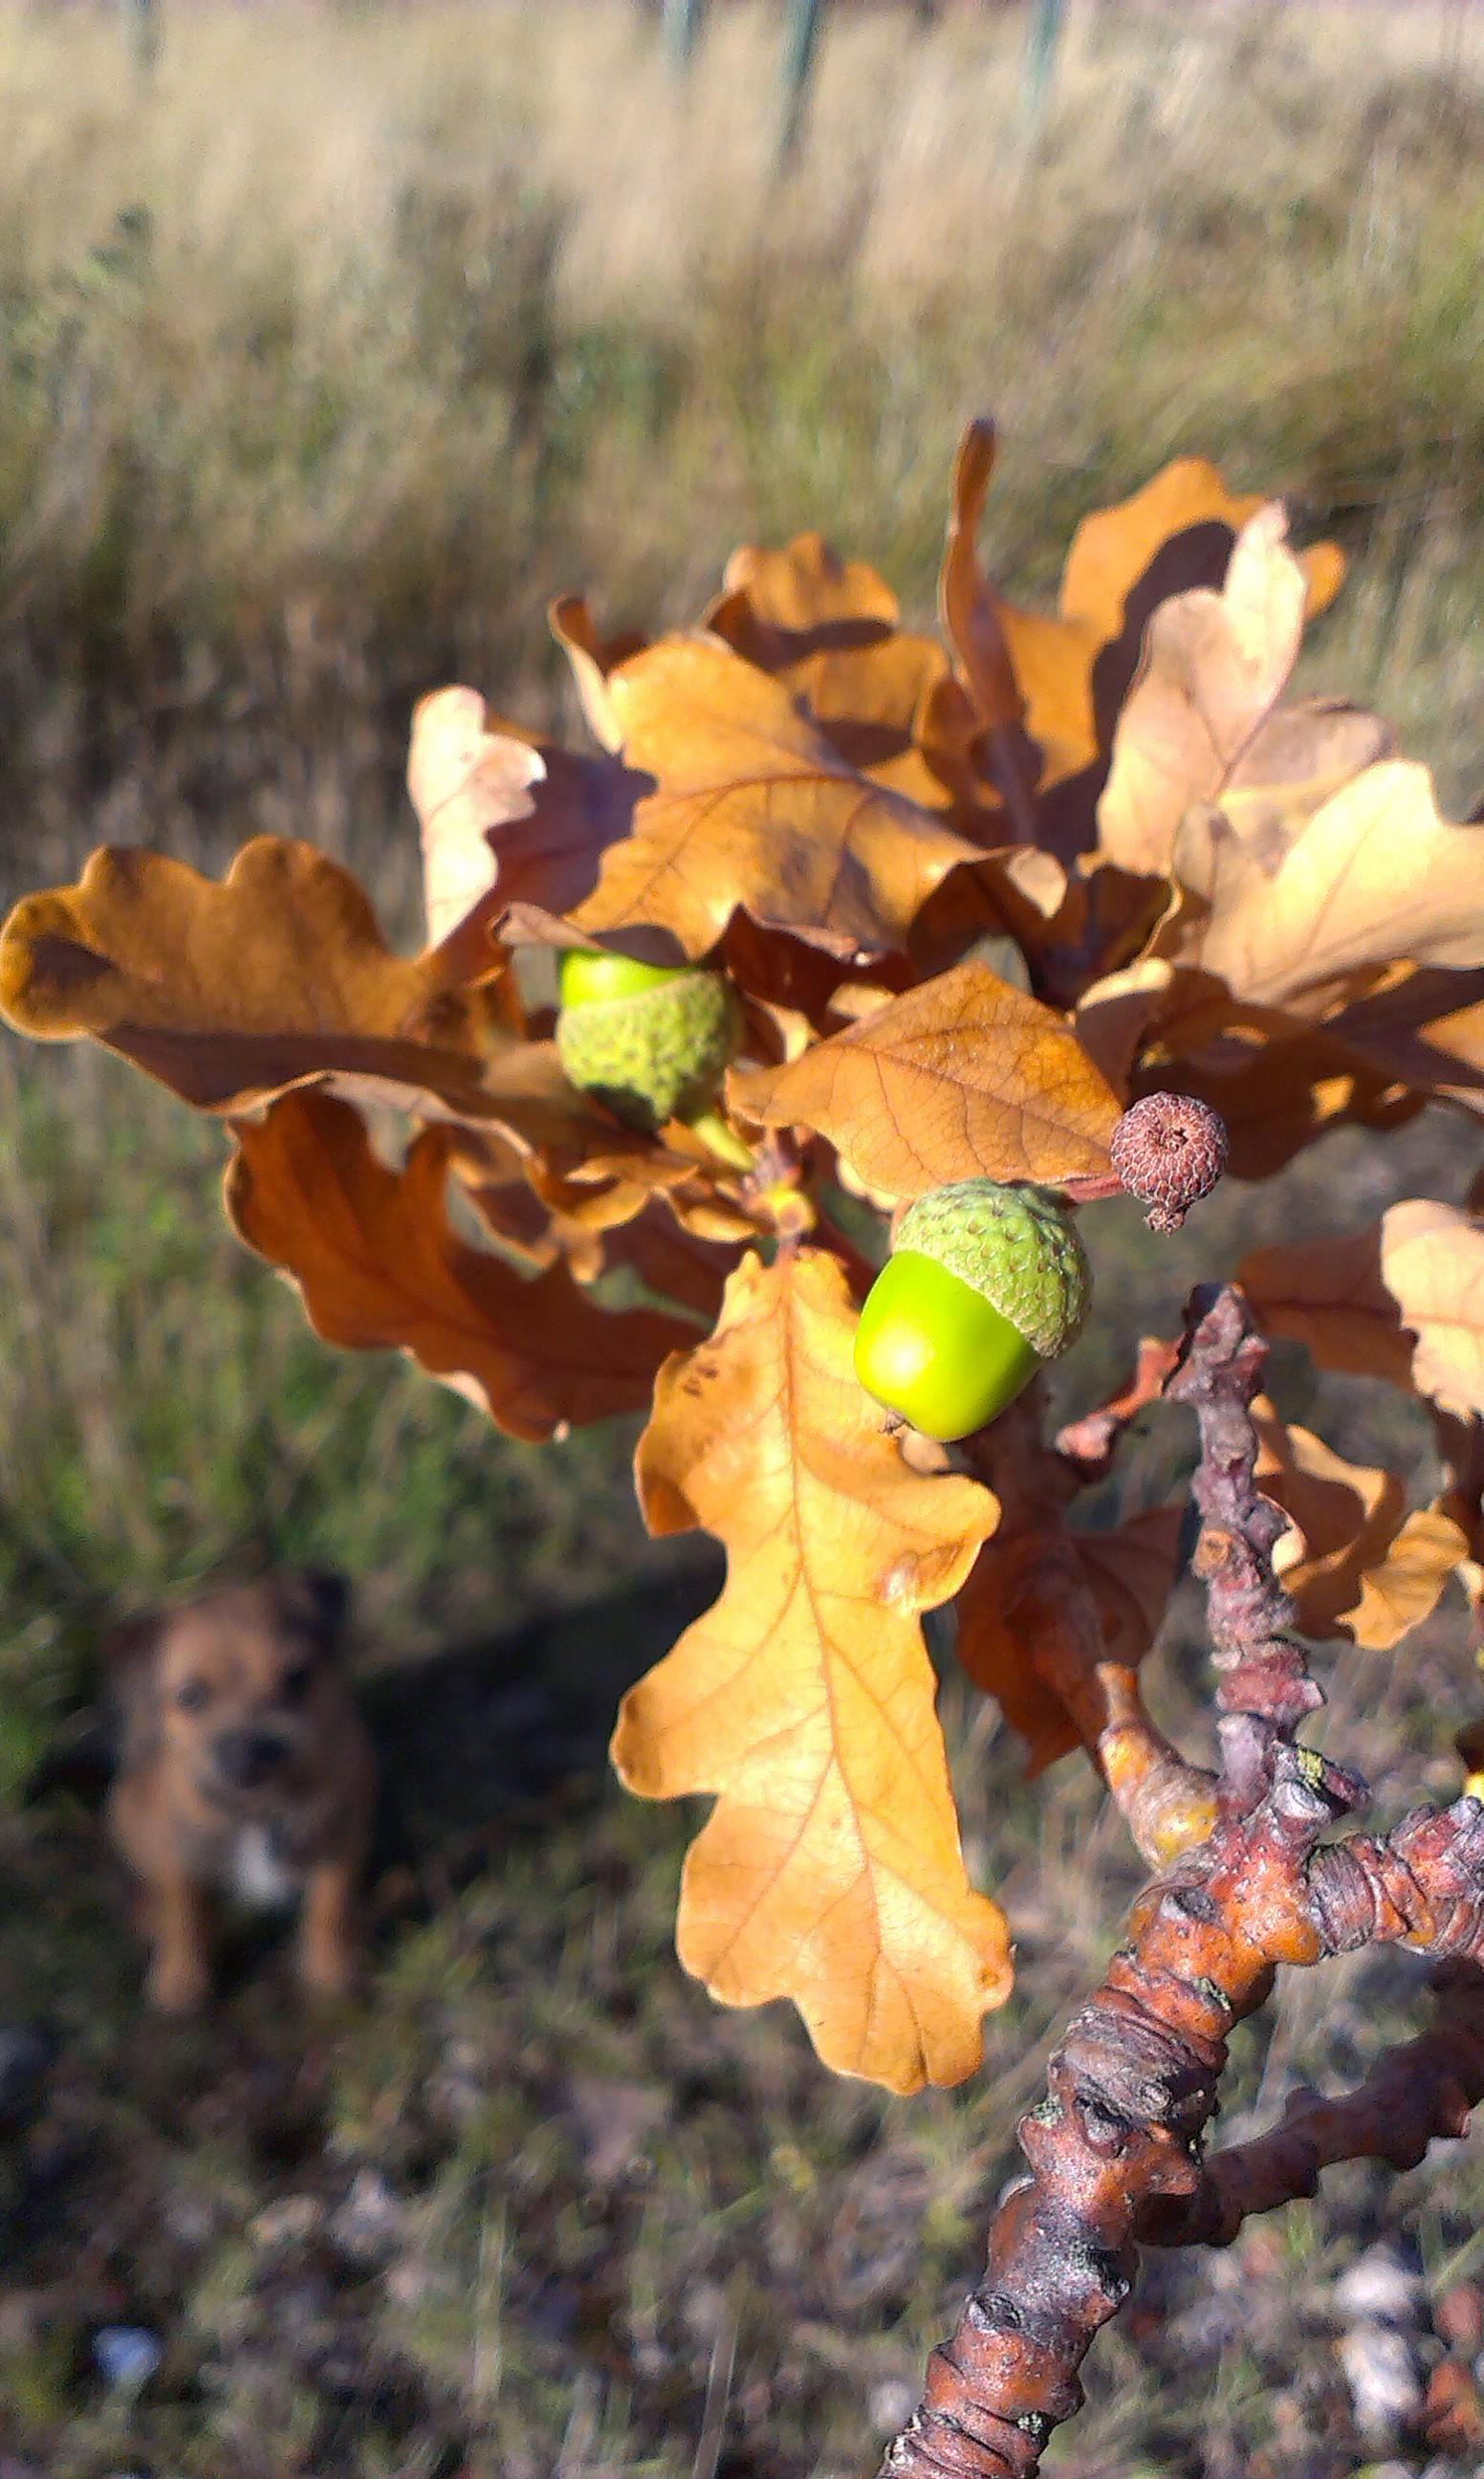 Acorns on a fallen branch